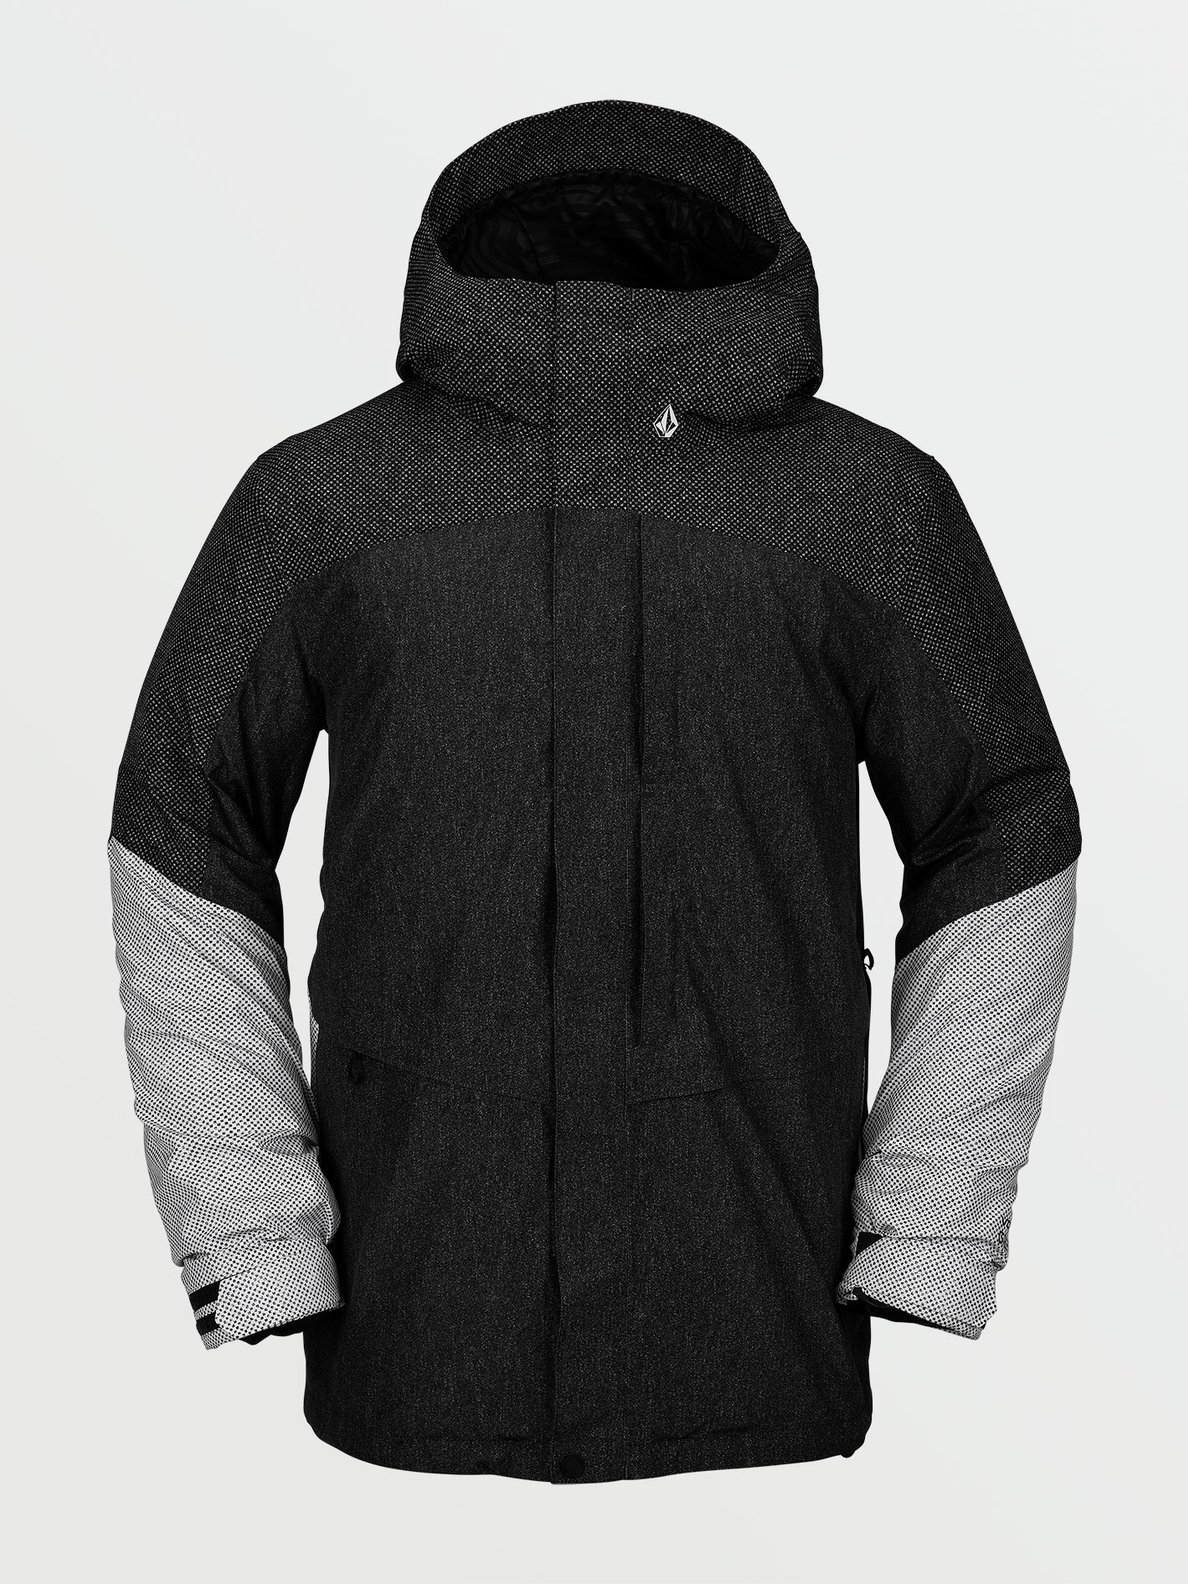 Volcom TDS 2L Gore Jacket